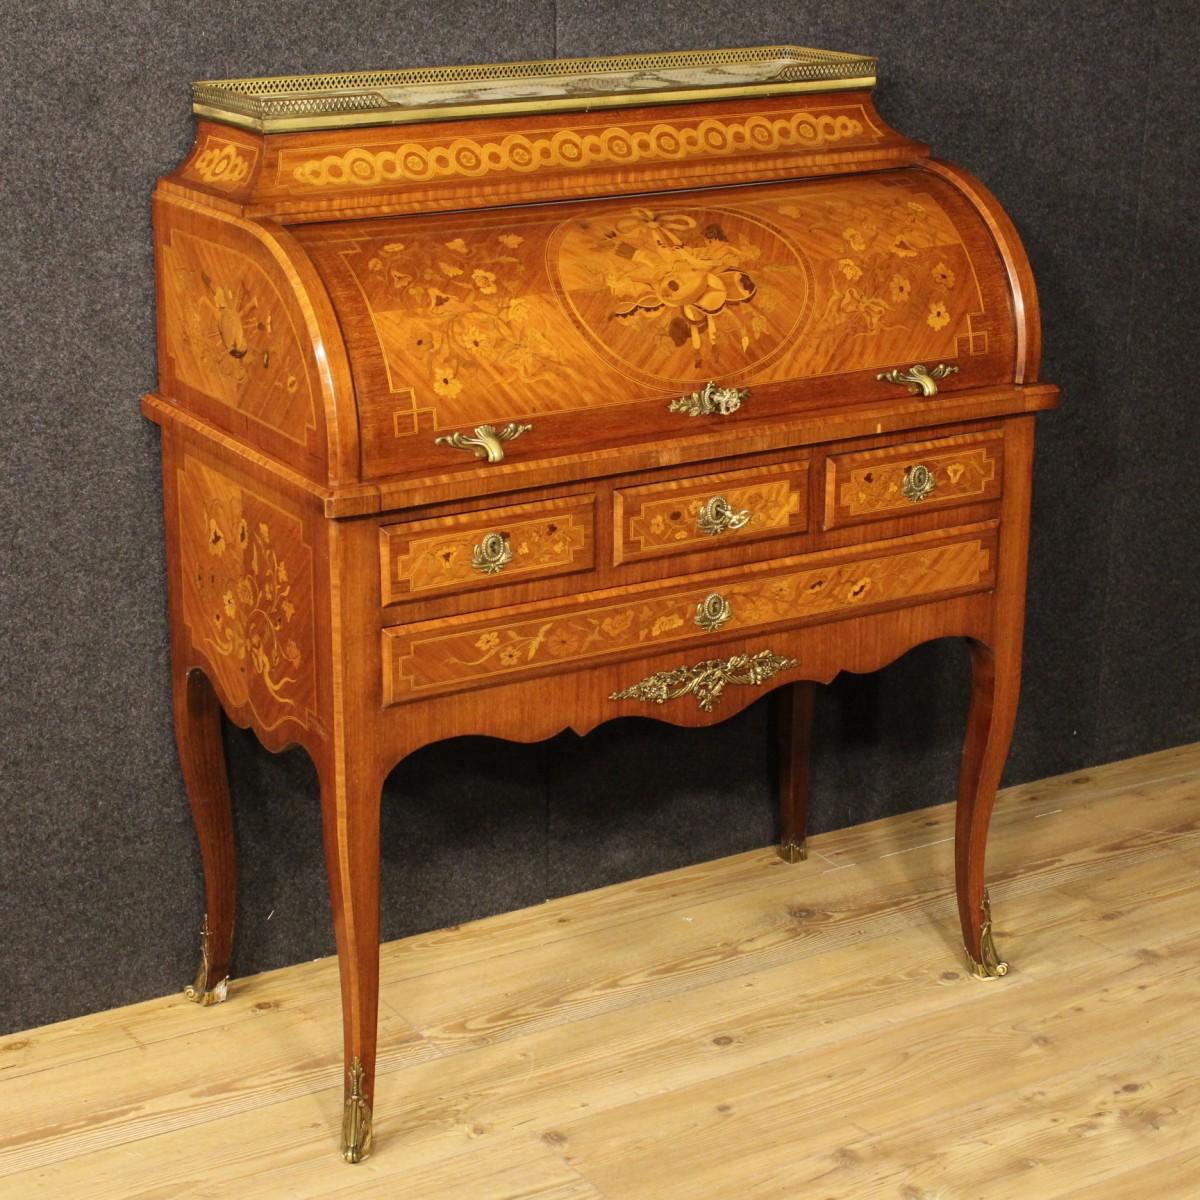 I mobili antichi in stile luigi xvi for Mobili luigi